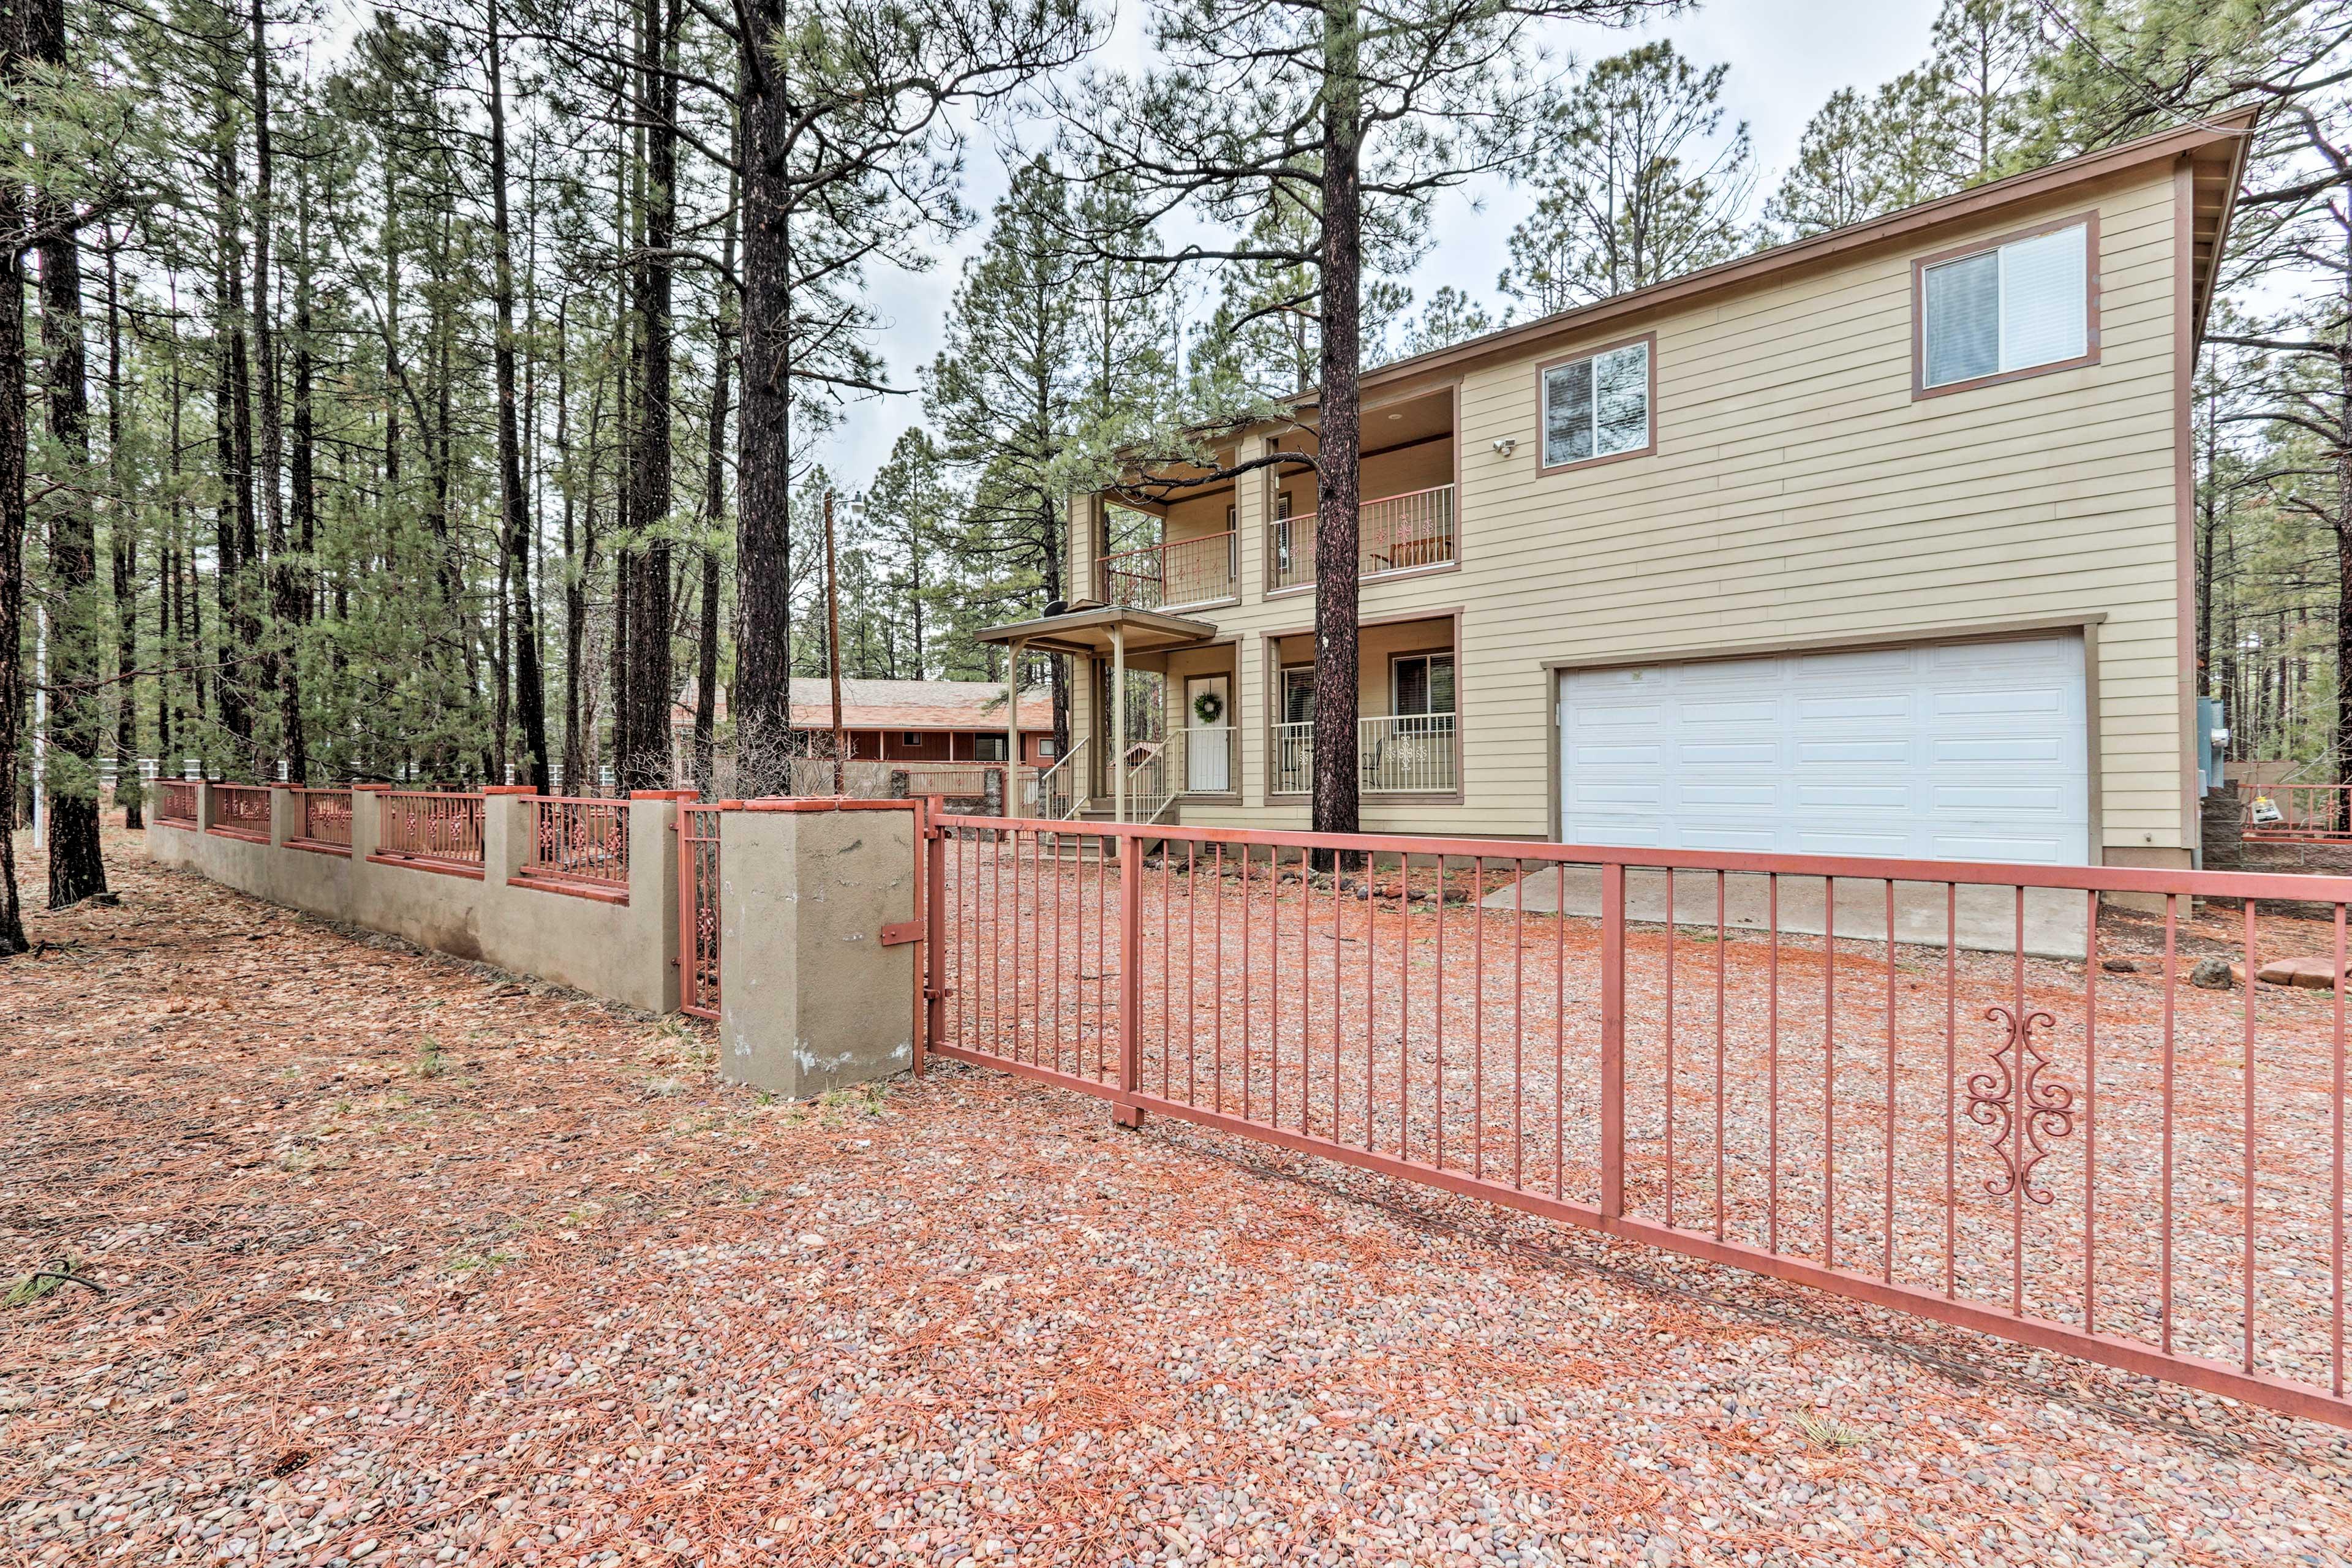 This Pinetop-Lakeside home awaits!